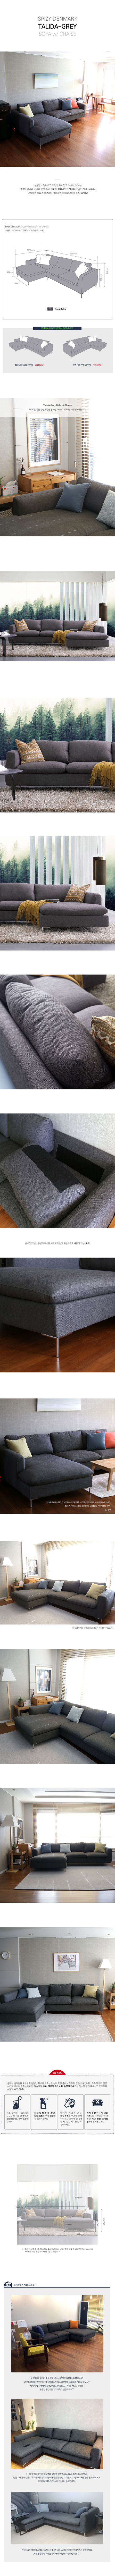 2_1_Talida-Grey_Sofa.jpg